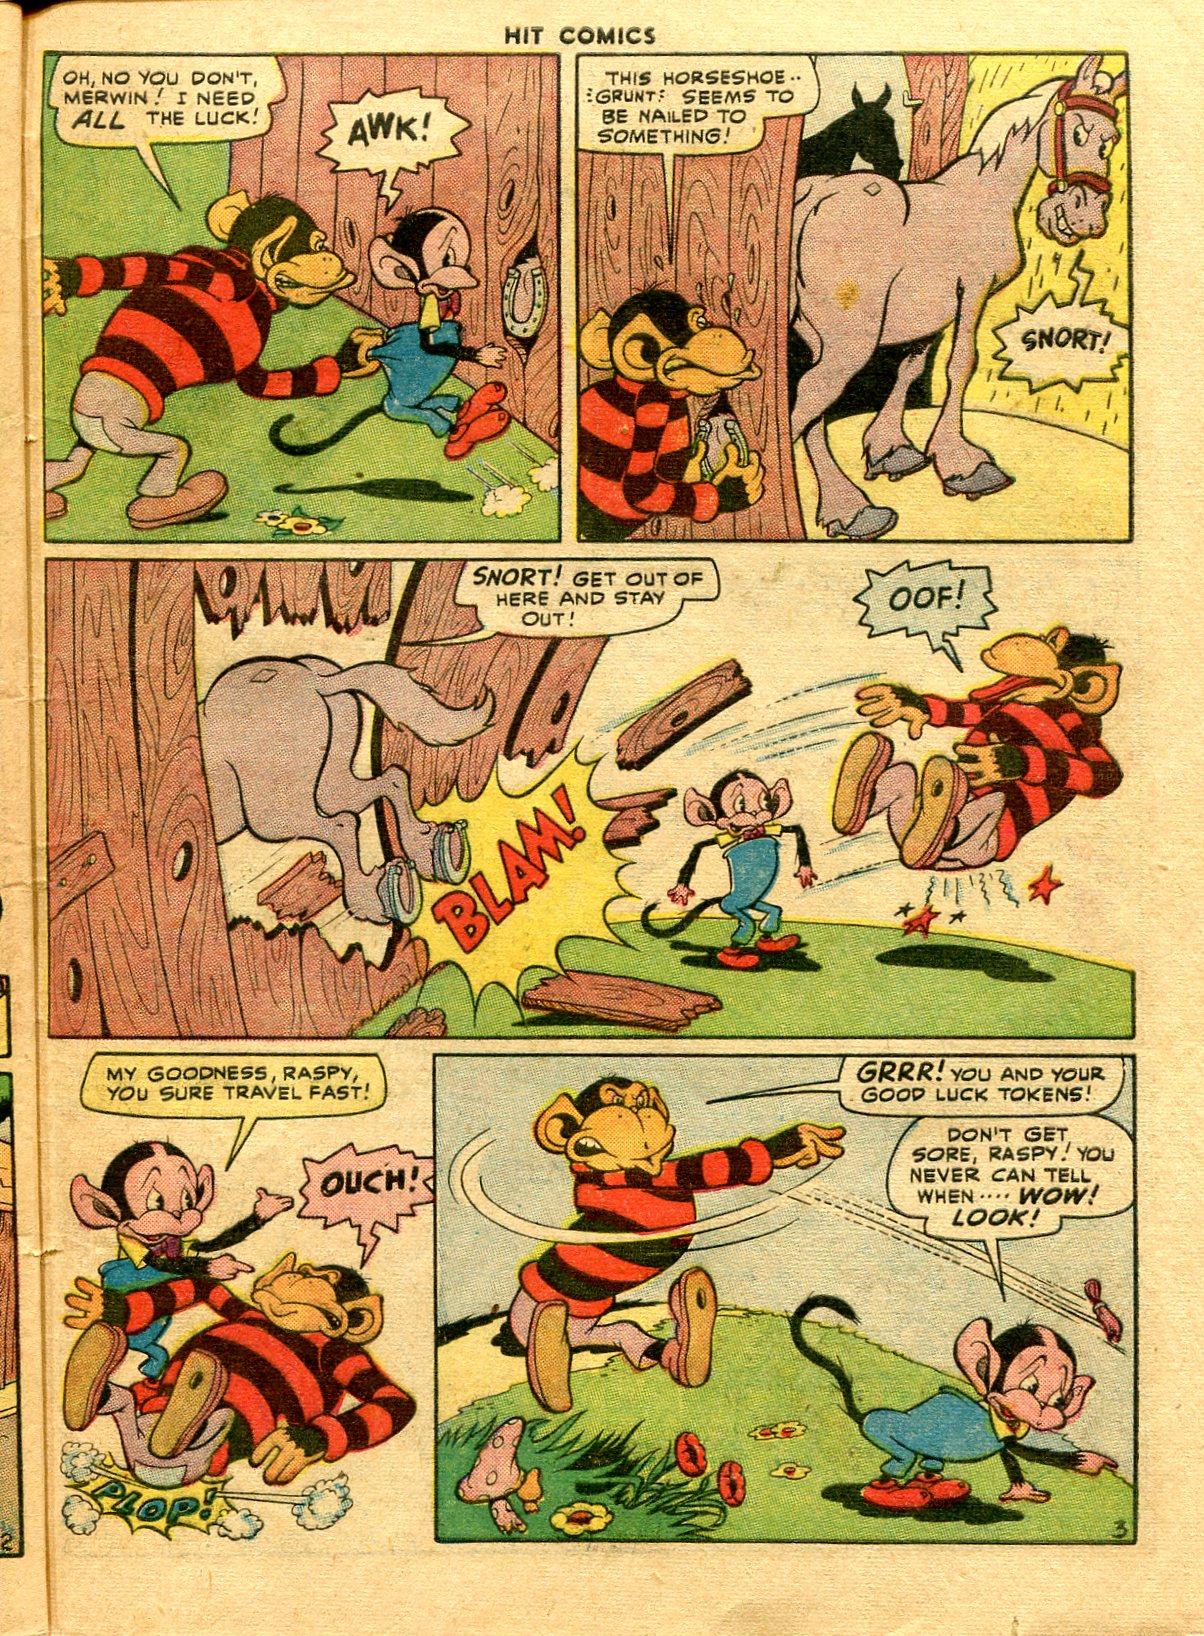 Read online Hit Comics comic -  Issue #48 - 47